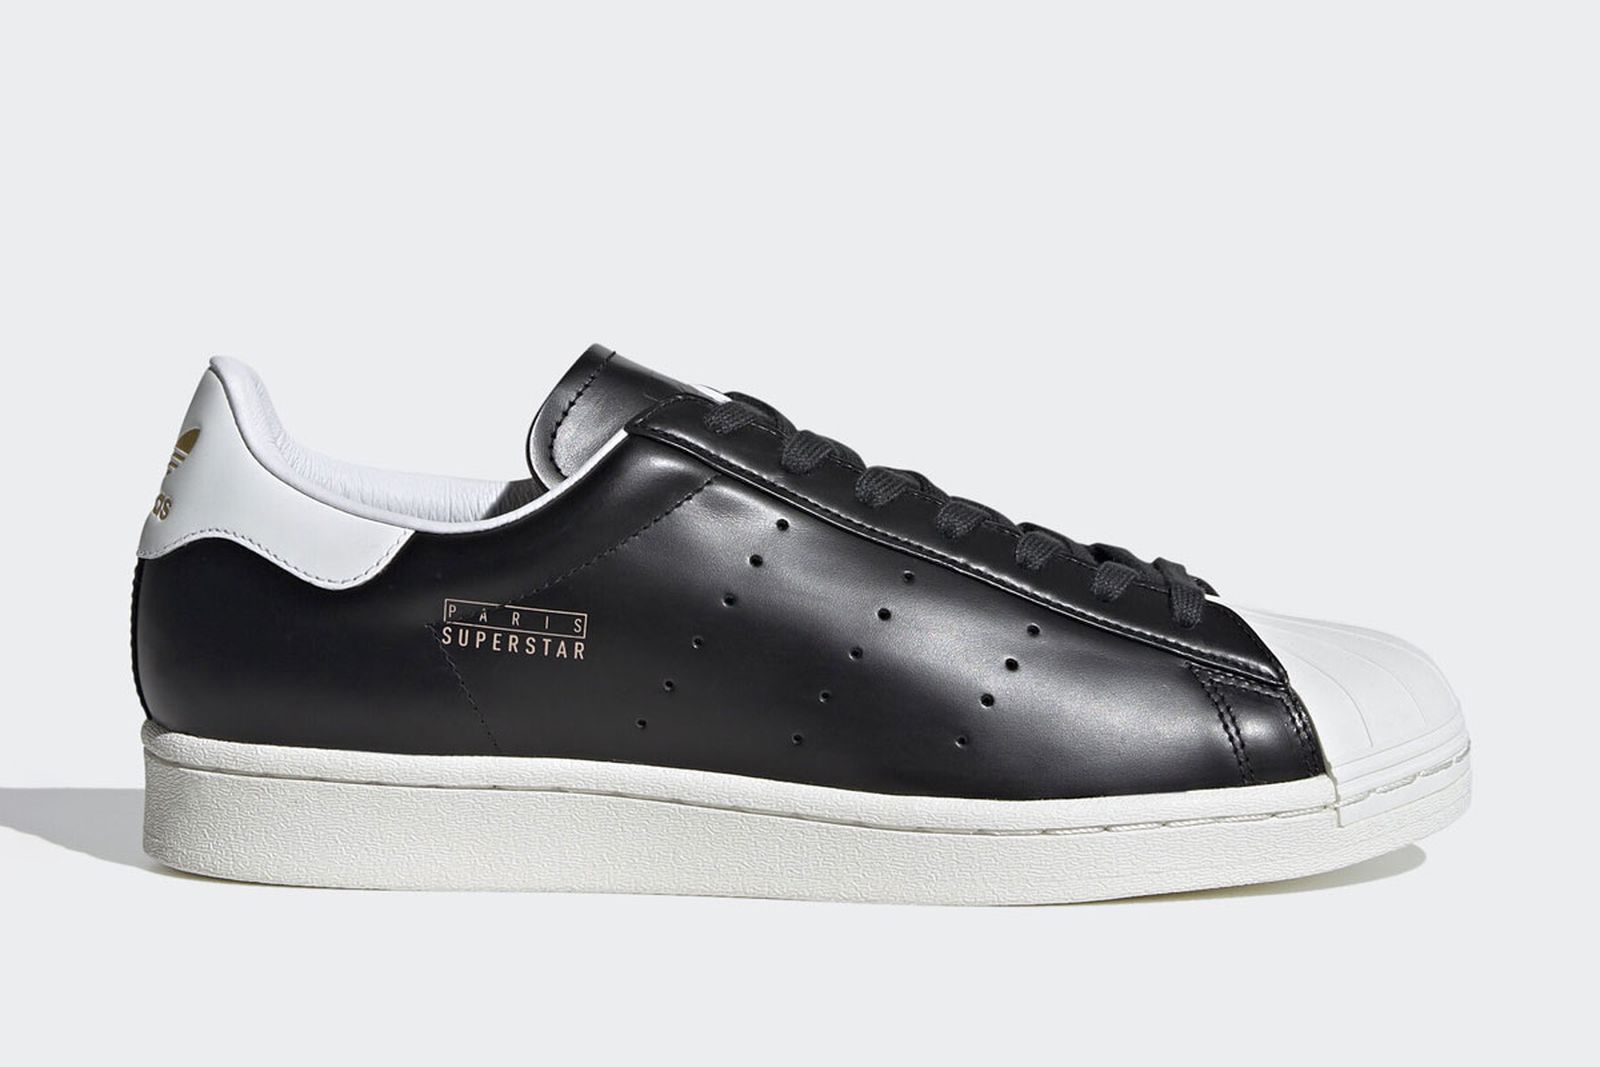 adidas-superstar-pure-paris-release-date-price-01